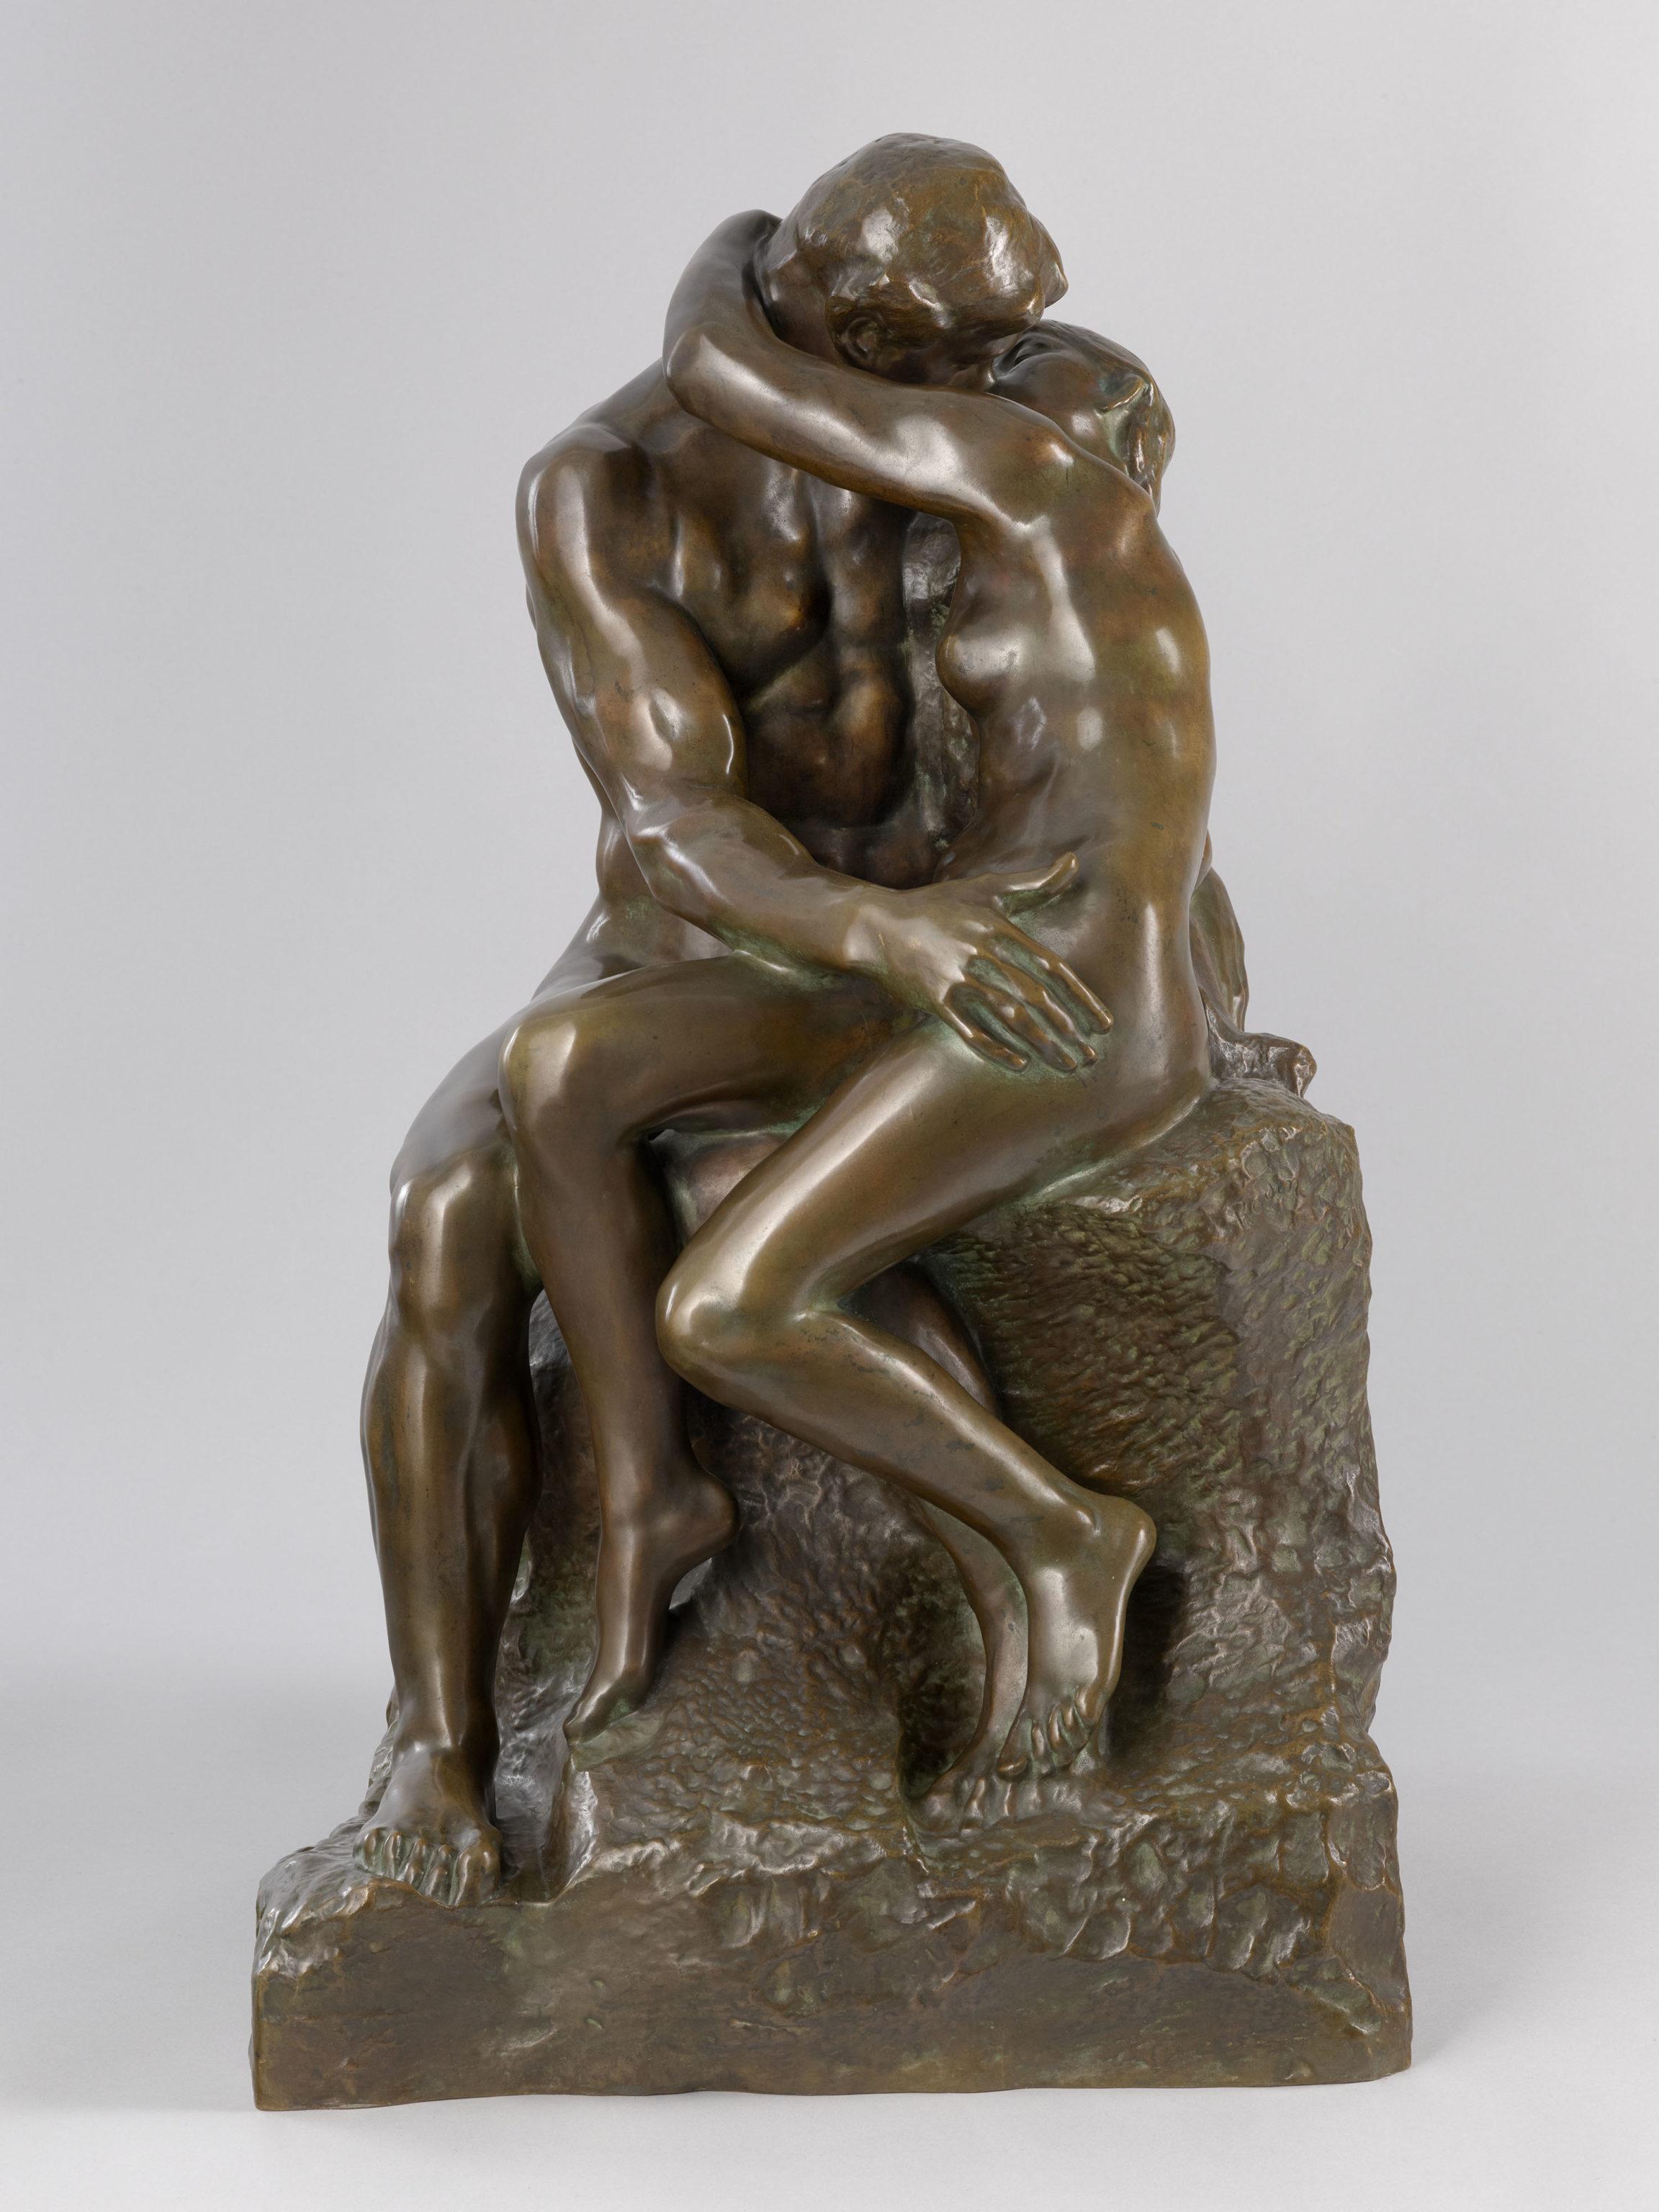 Auguste Rodin, Le baiser, 1886